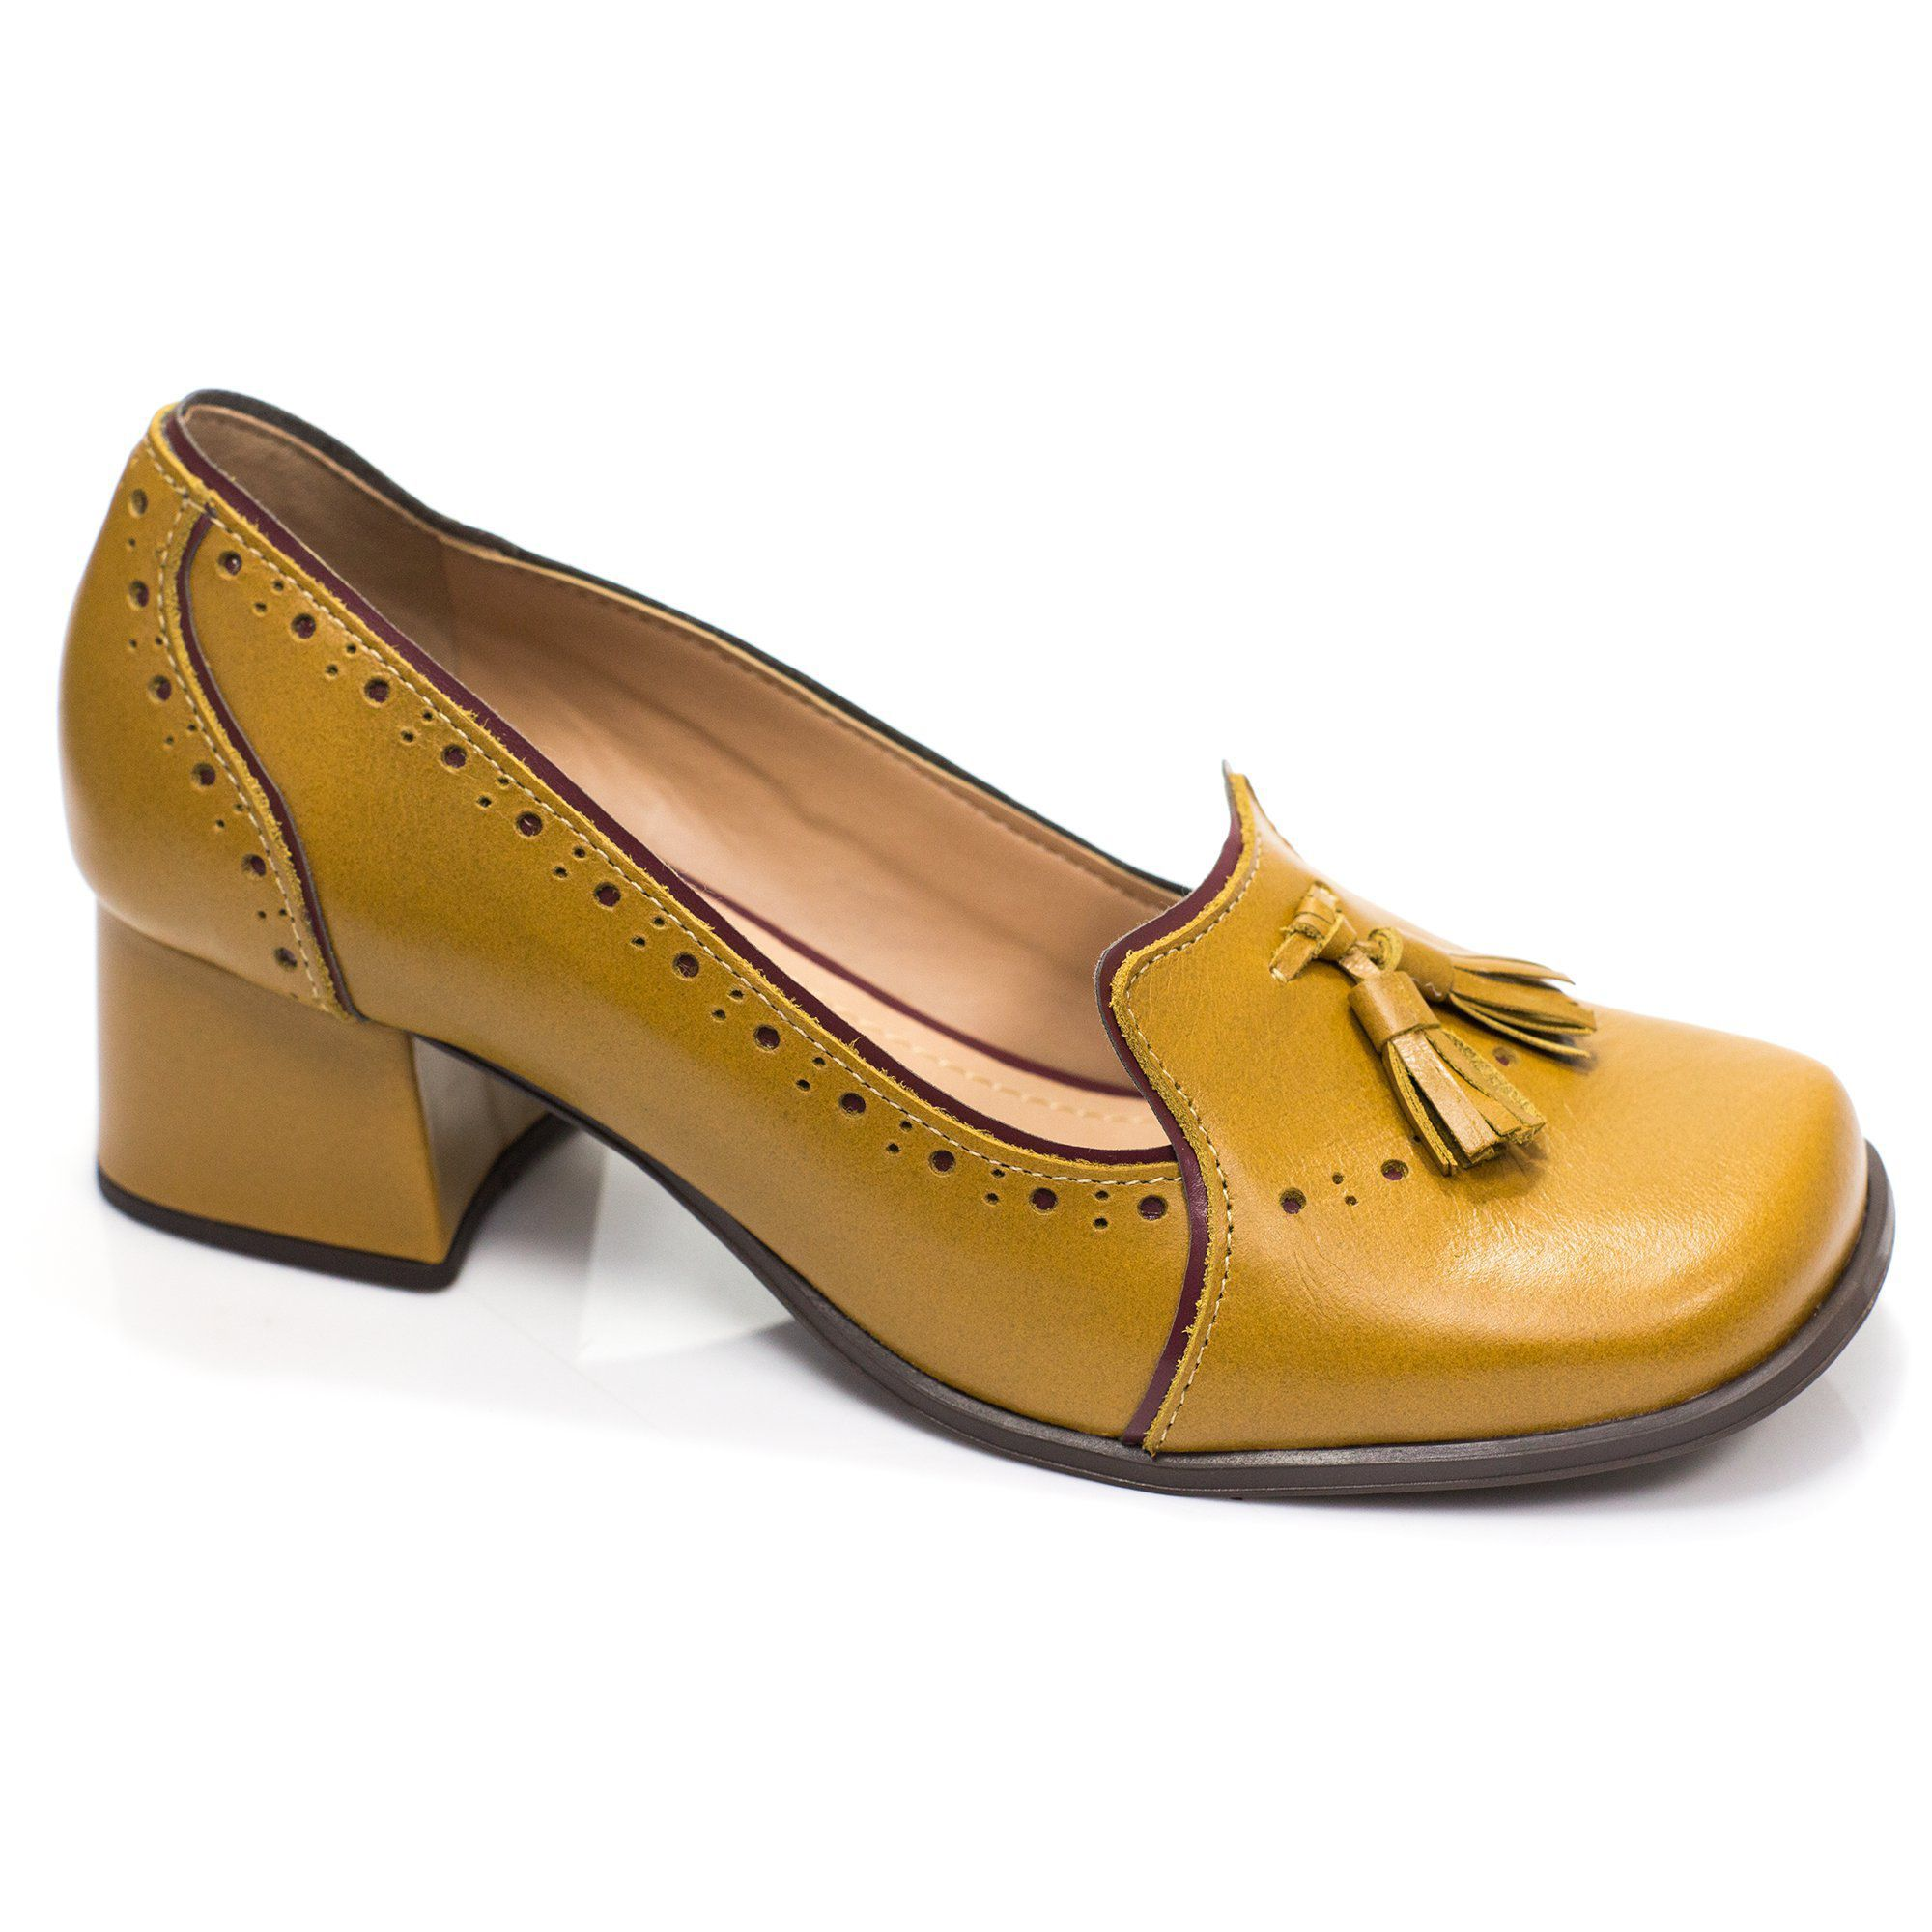 De de das sapato mulheres couro palmilhas